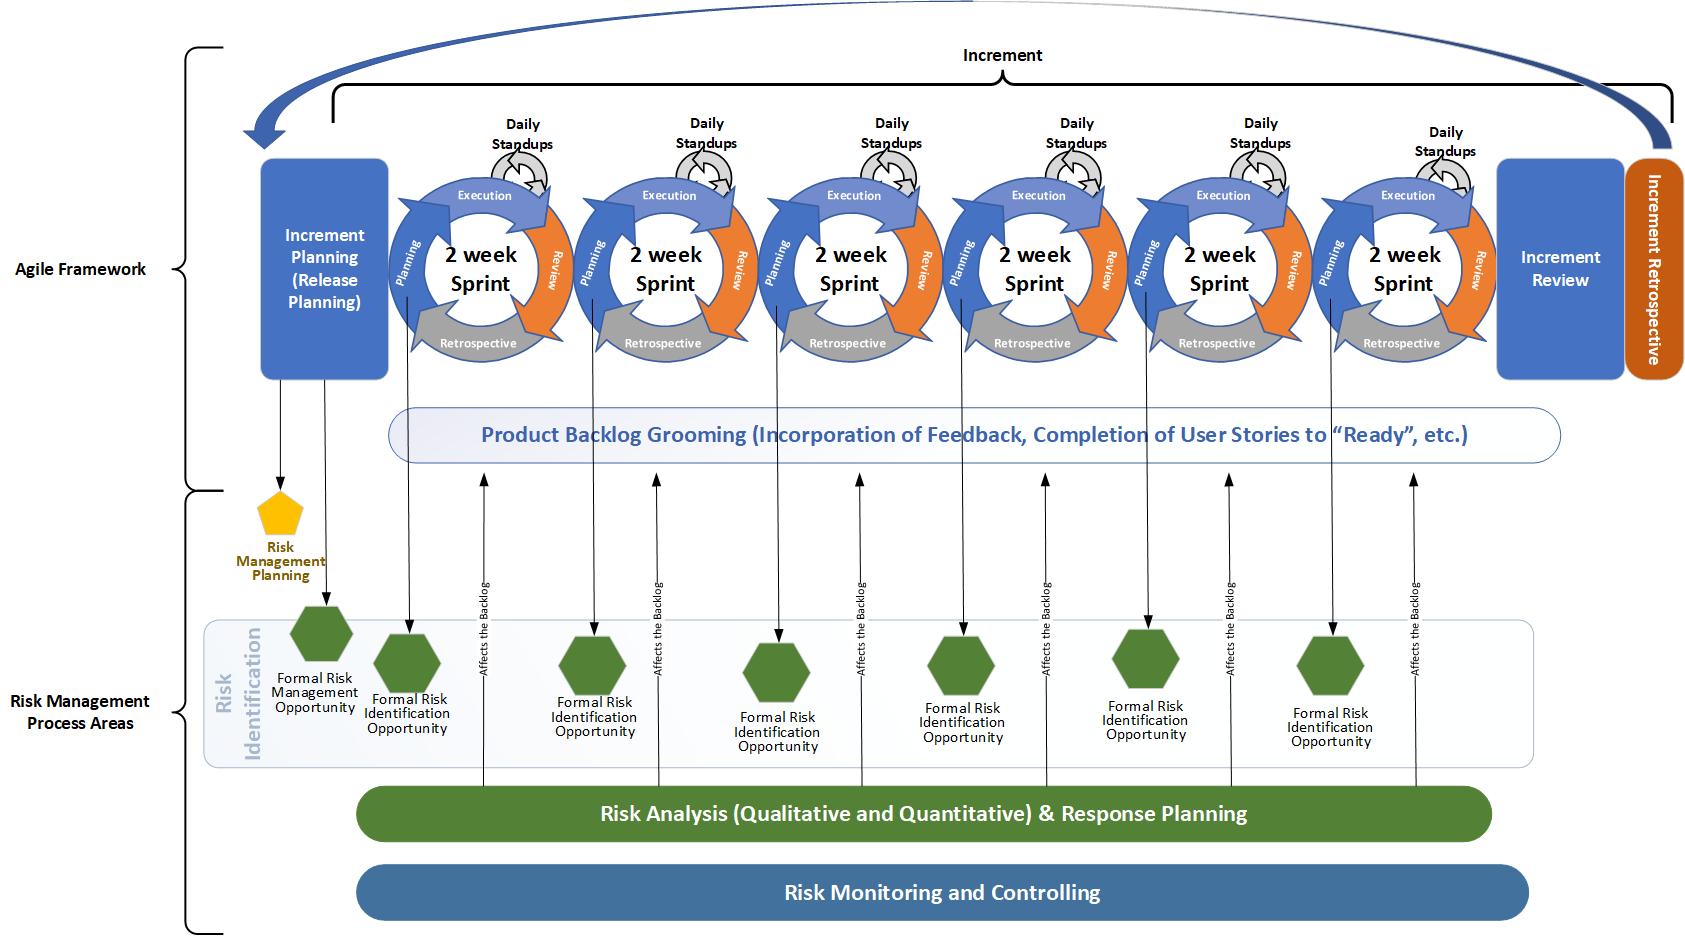 Image of Agile Risk Management